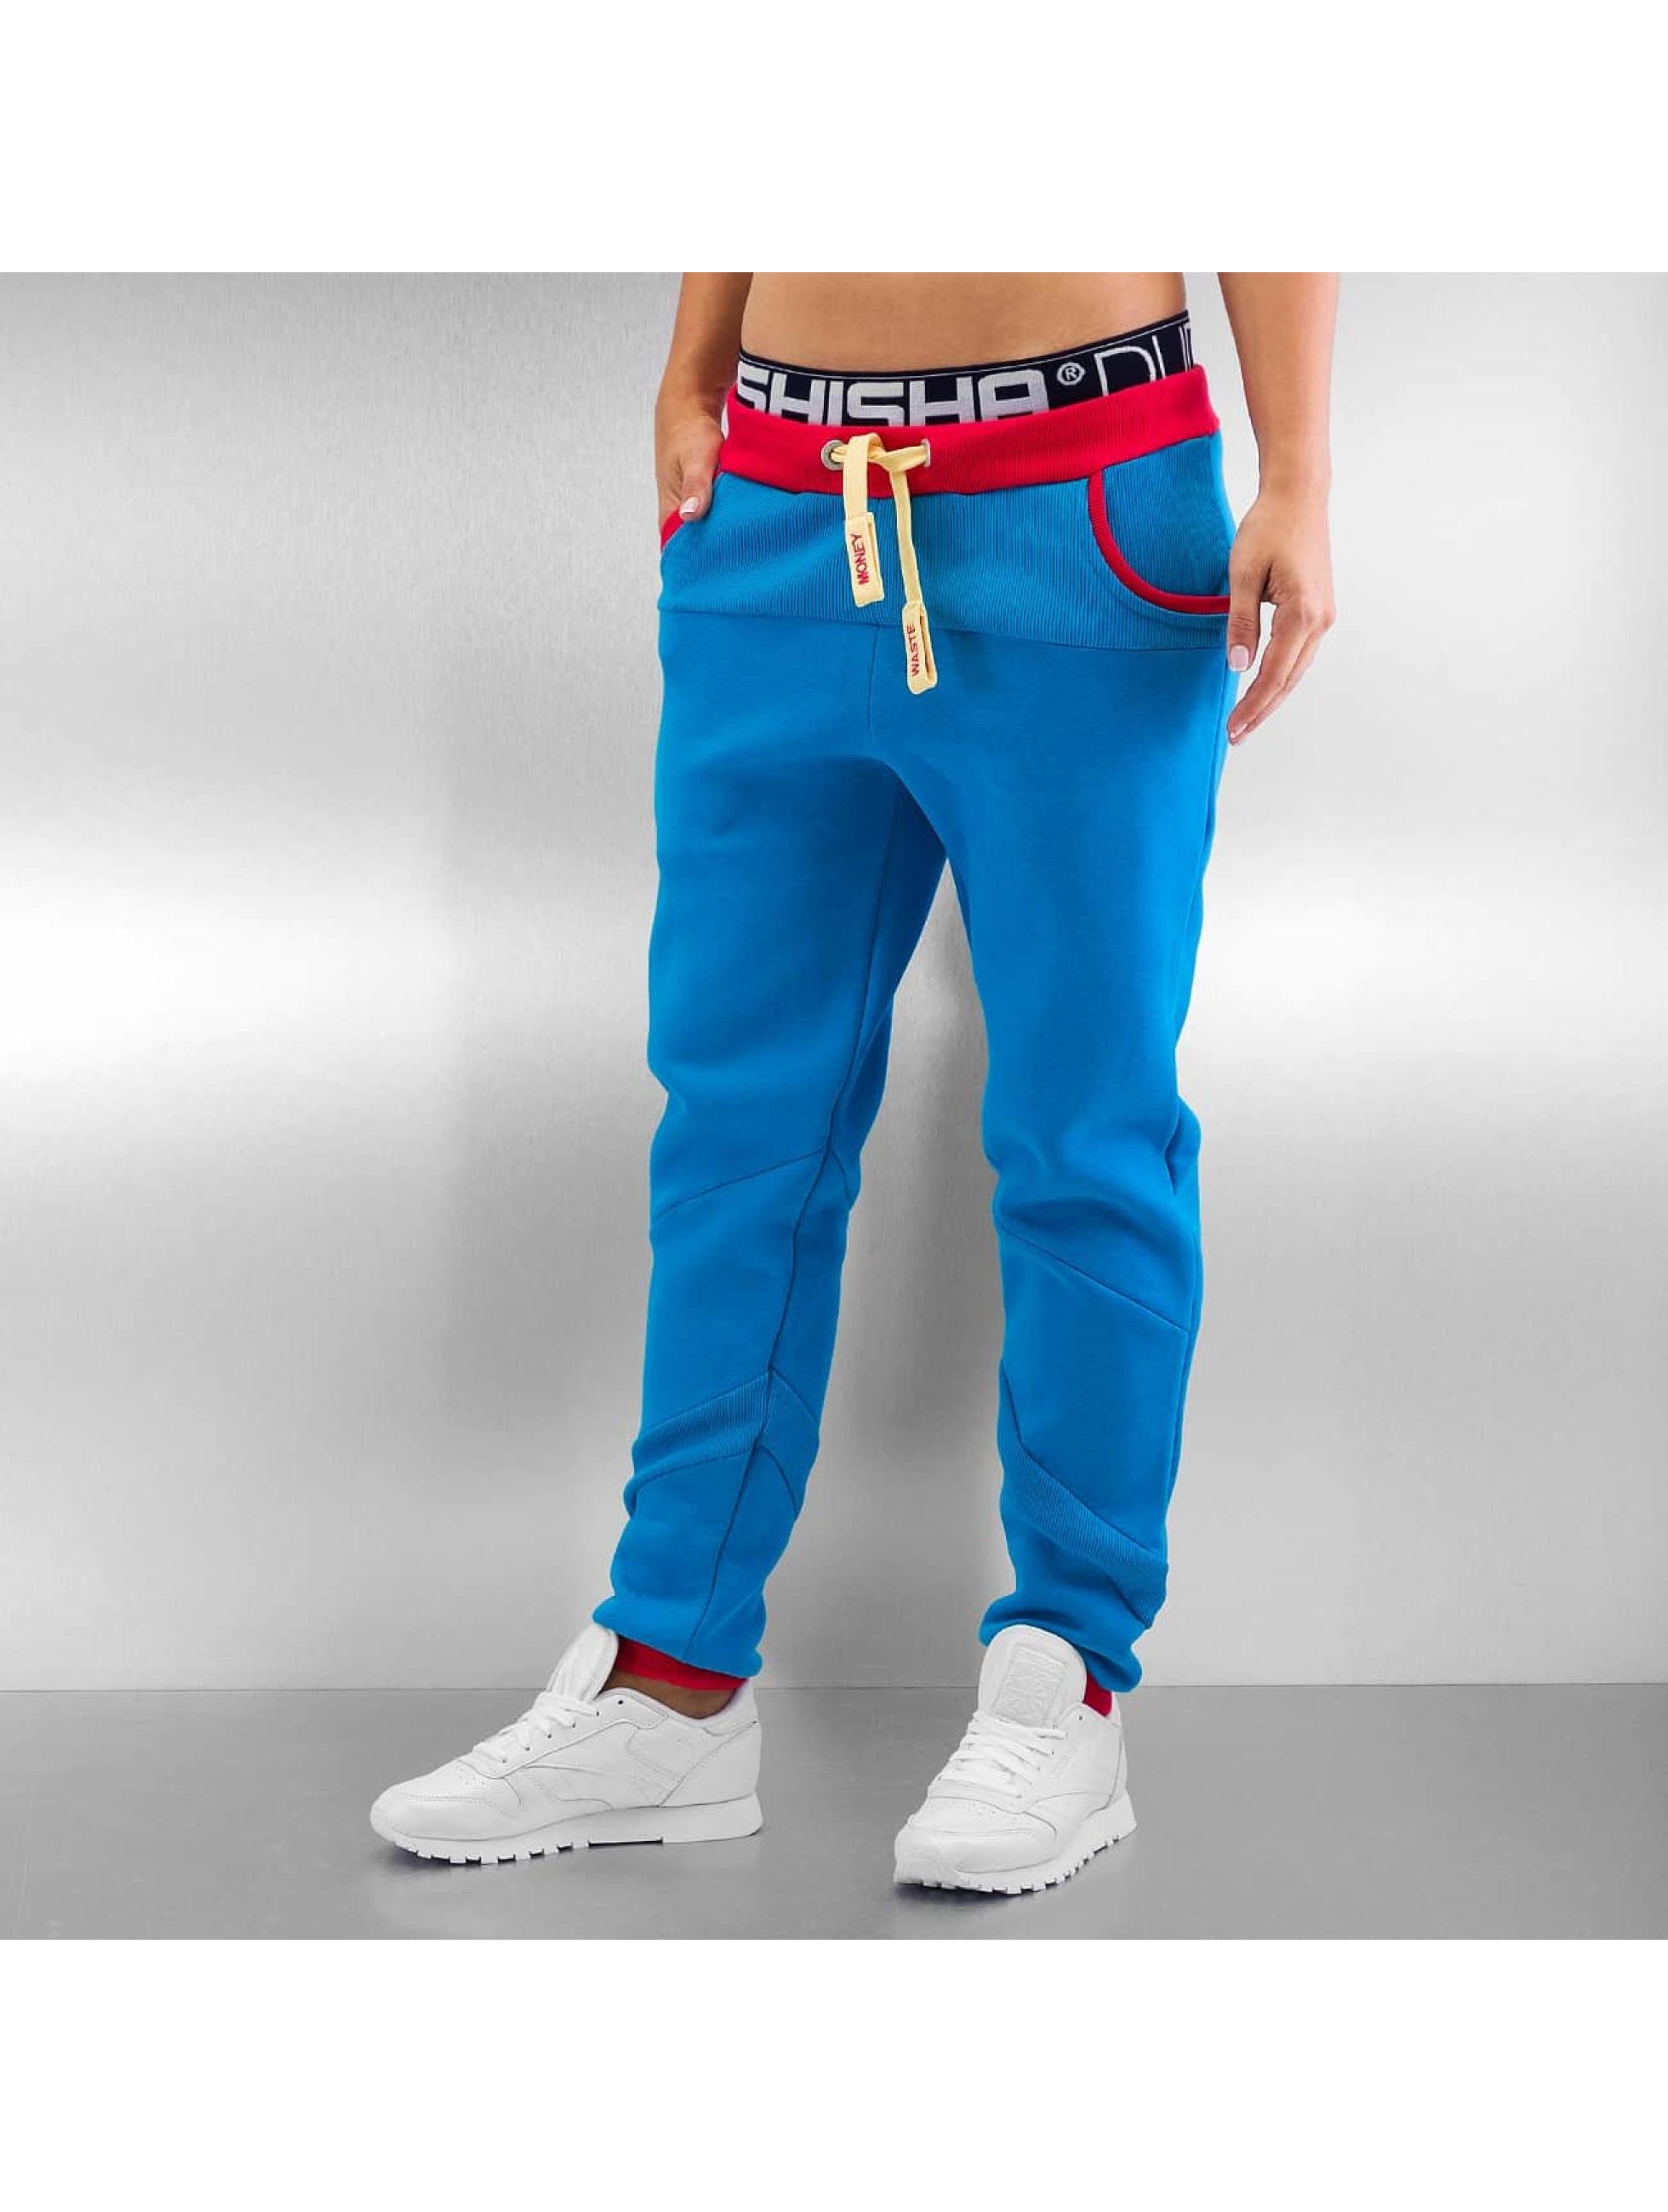 Jogginghose Weeken in blau